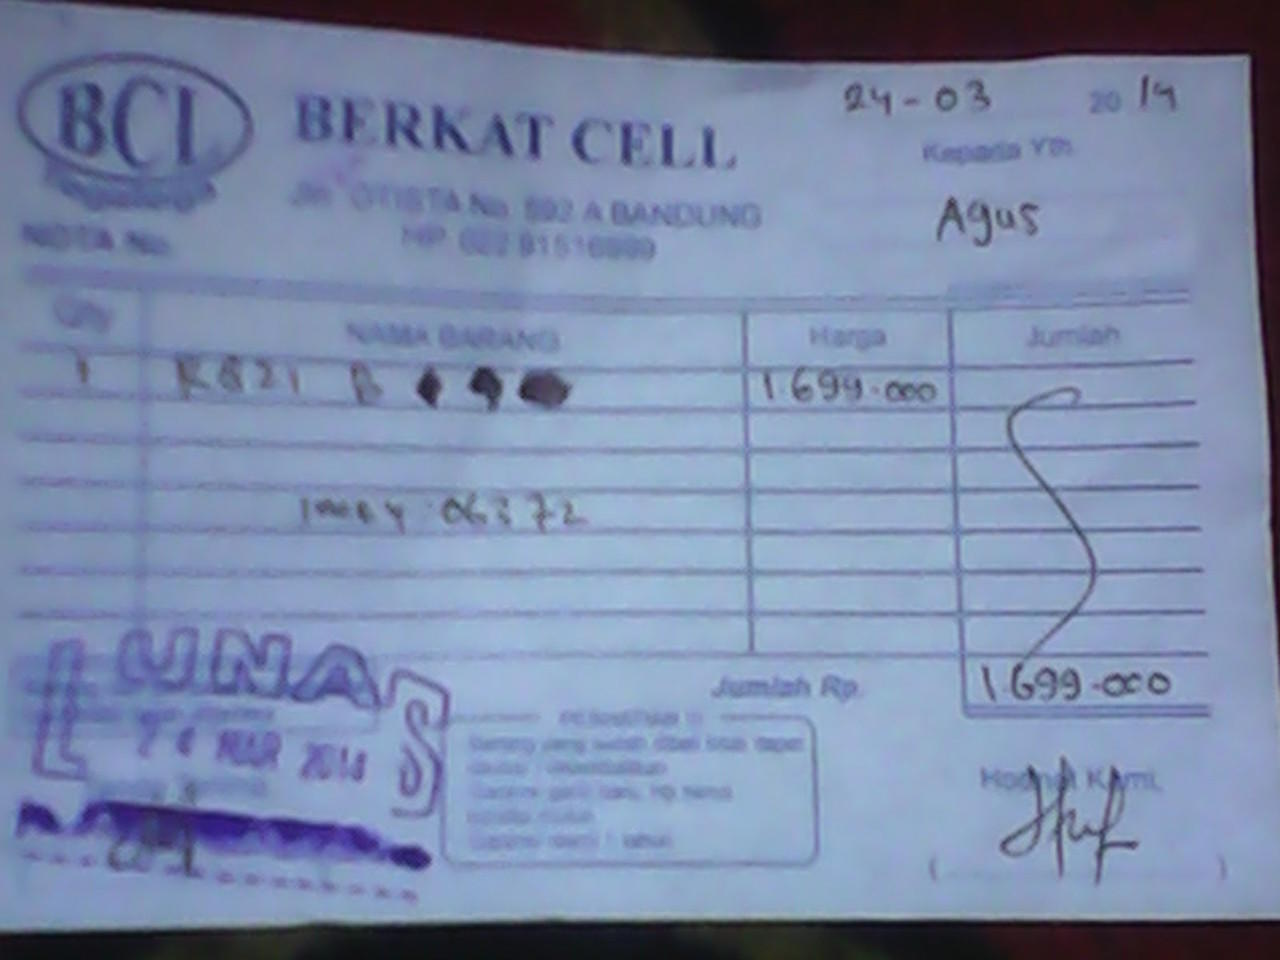 hp handphone oppo find muse r821 binb black murah meriah bandung